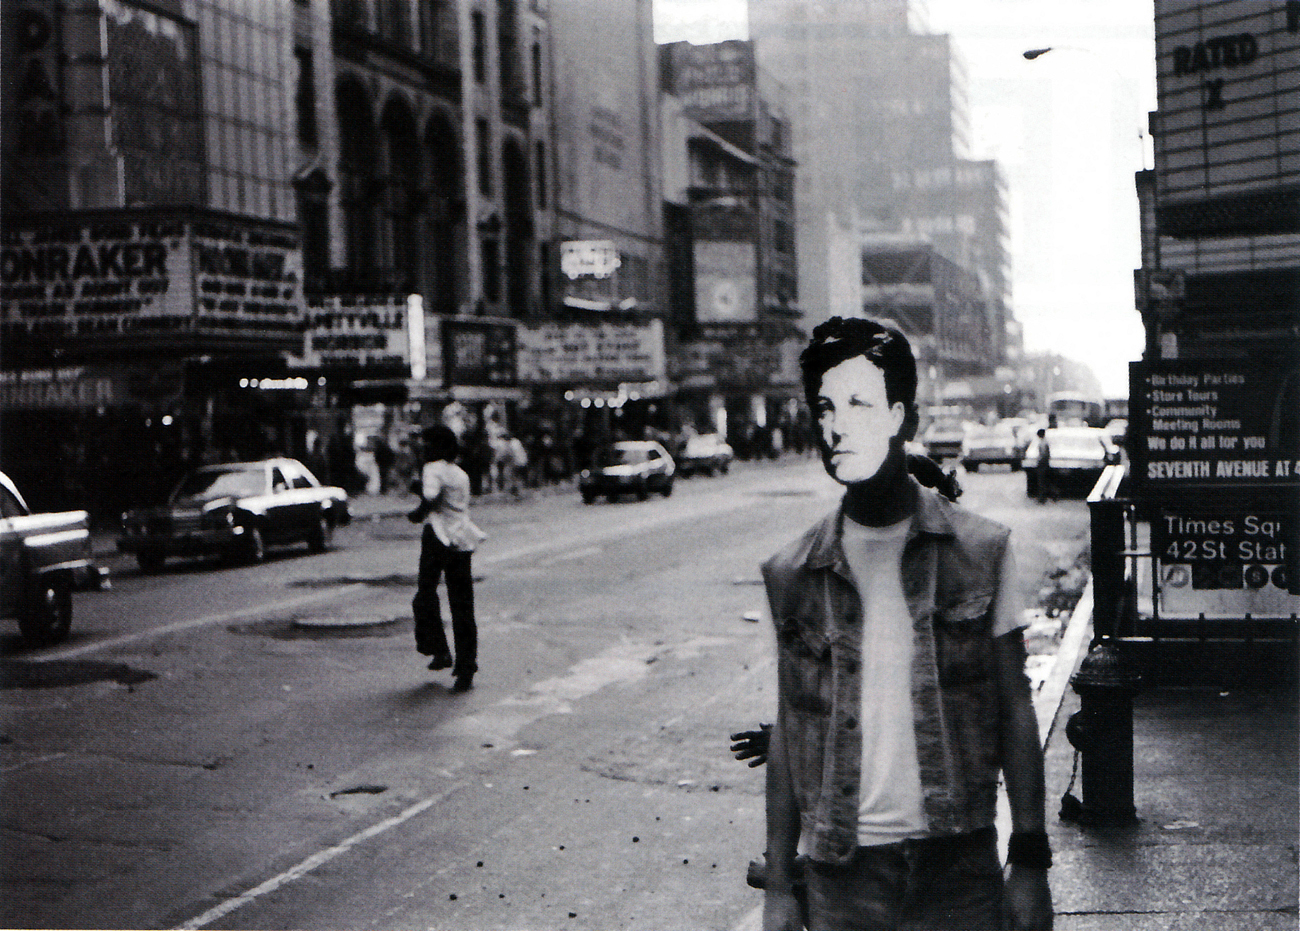 David Wojnarowicz, Arthur Rimbaud in New York, 1978-9, gelatin silver print on paper.